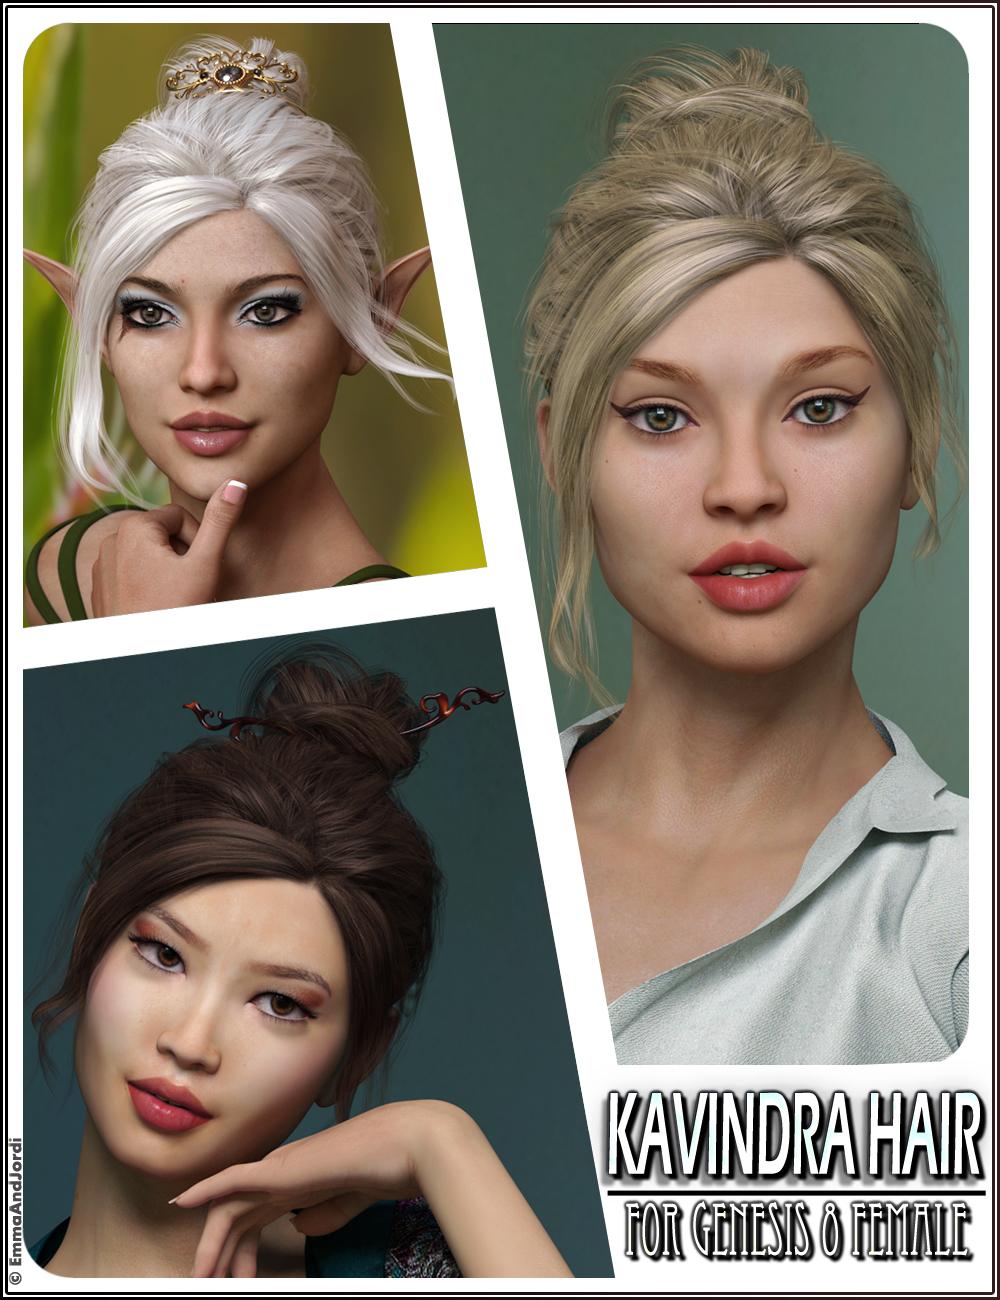 Kavindra Hair For Genesis 8 Female(s) by: EmmaAndJordi, 3D Models by Daz 3D